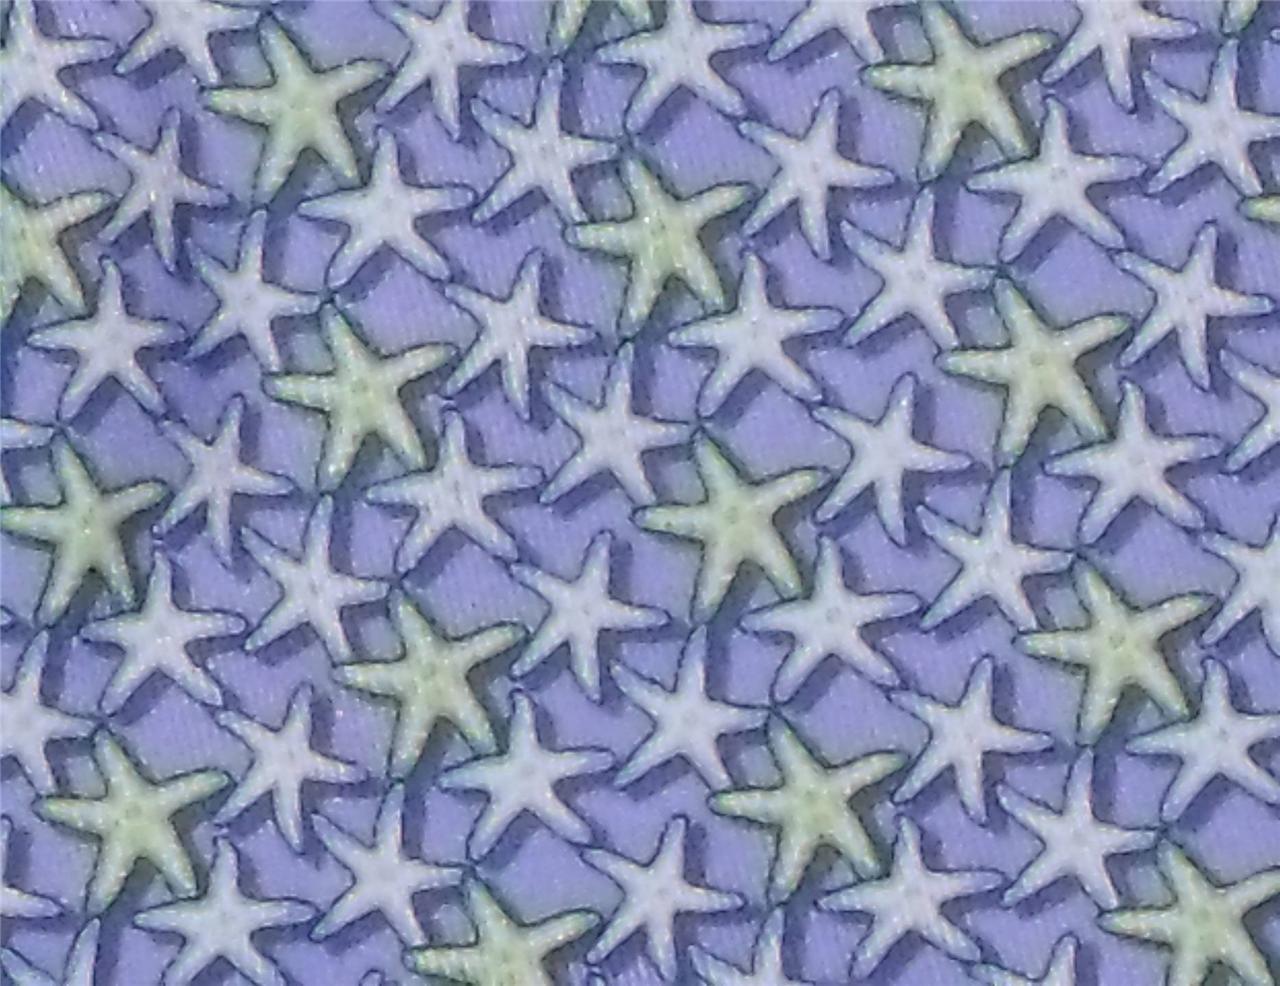 Details about Vineyard Vines  quot SeaStar quot  Nautical Fish Print Tie NWT  85    Vineyard Vines Fish Pattern